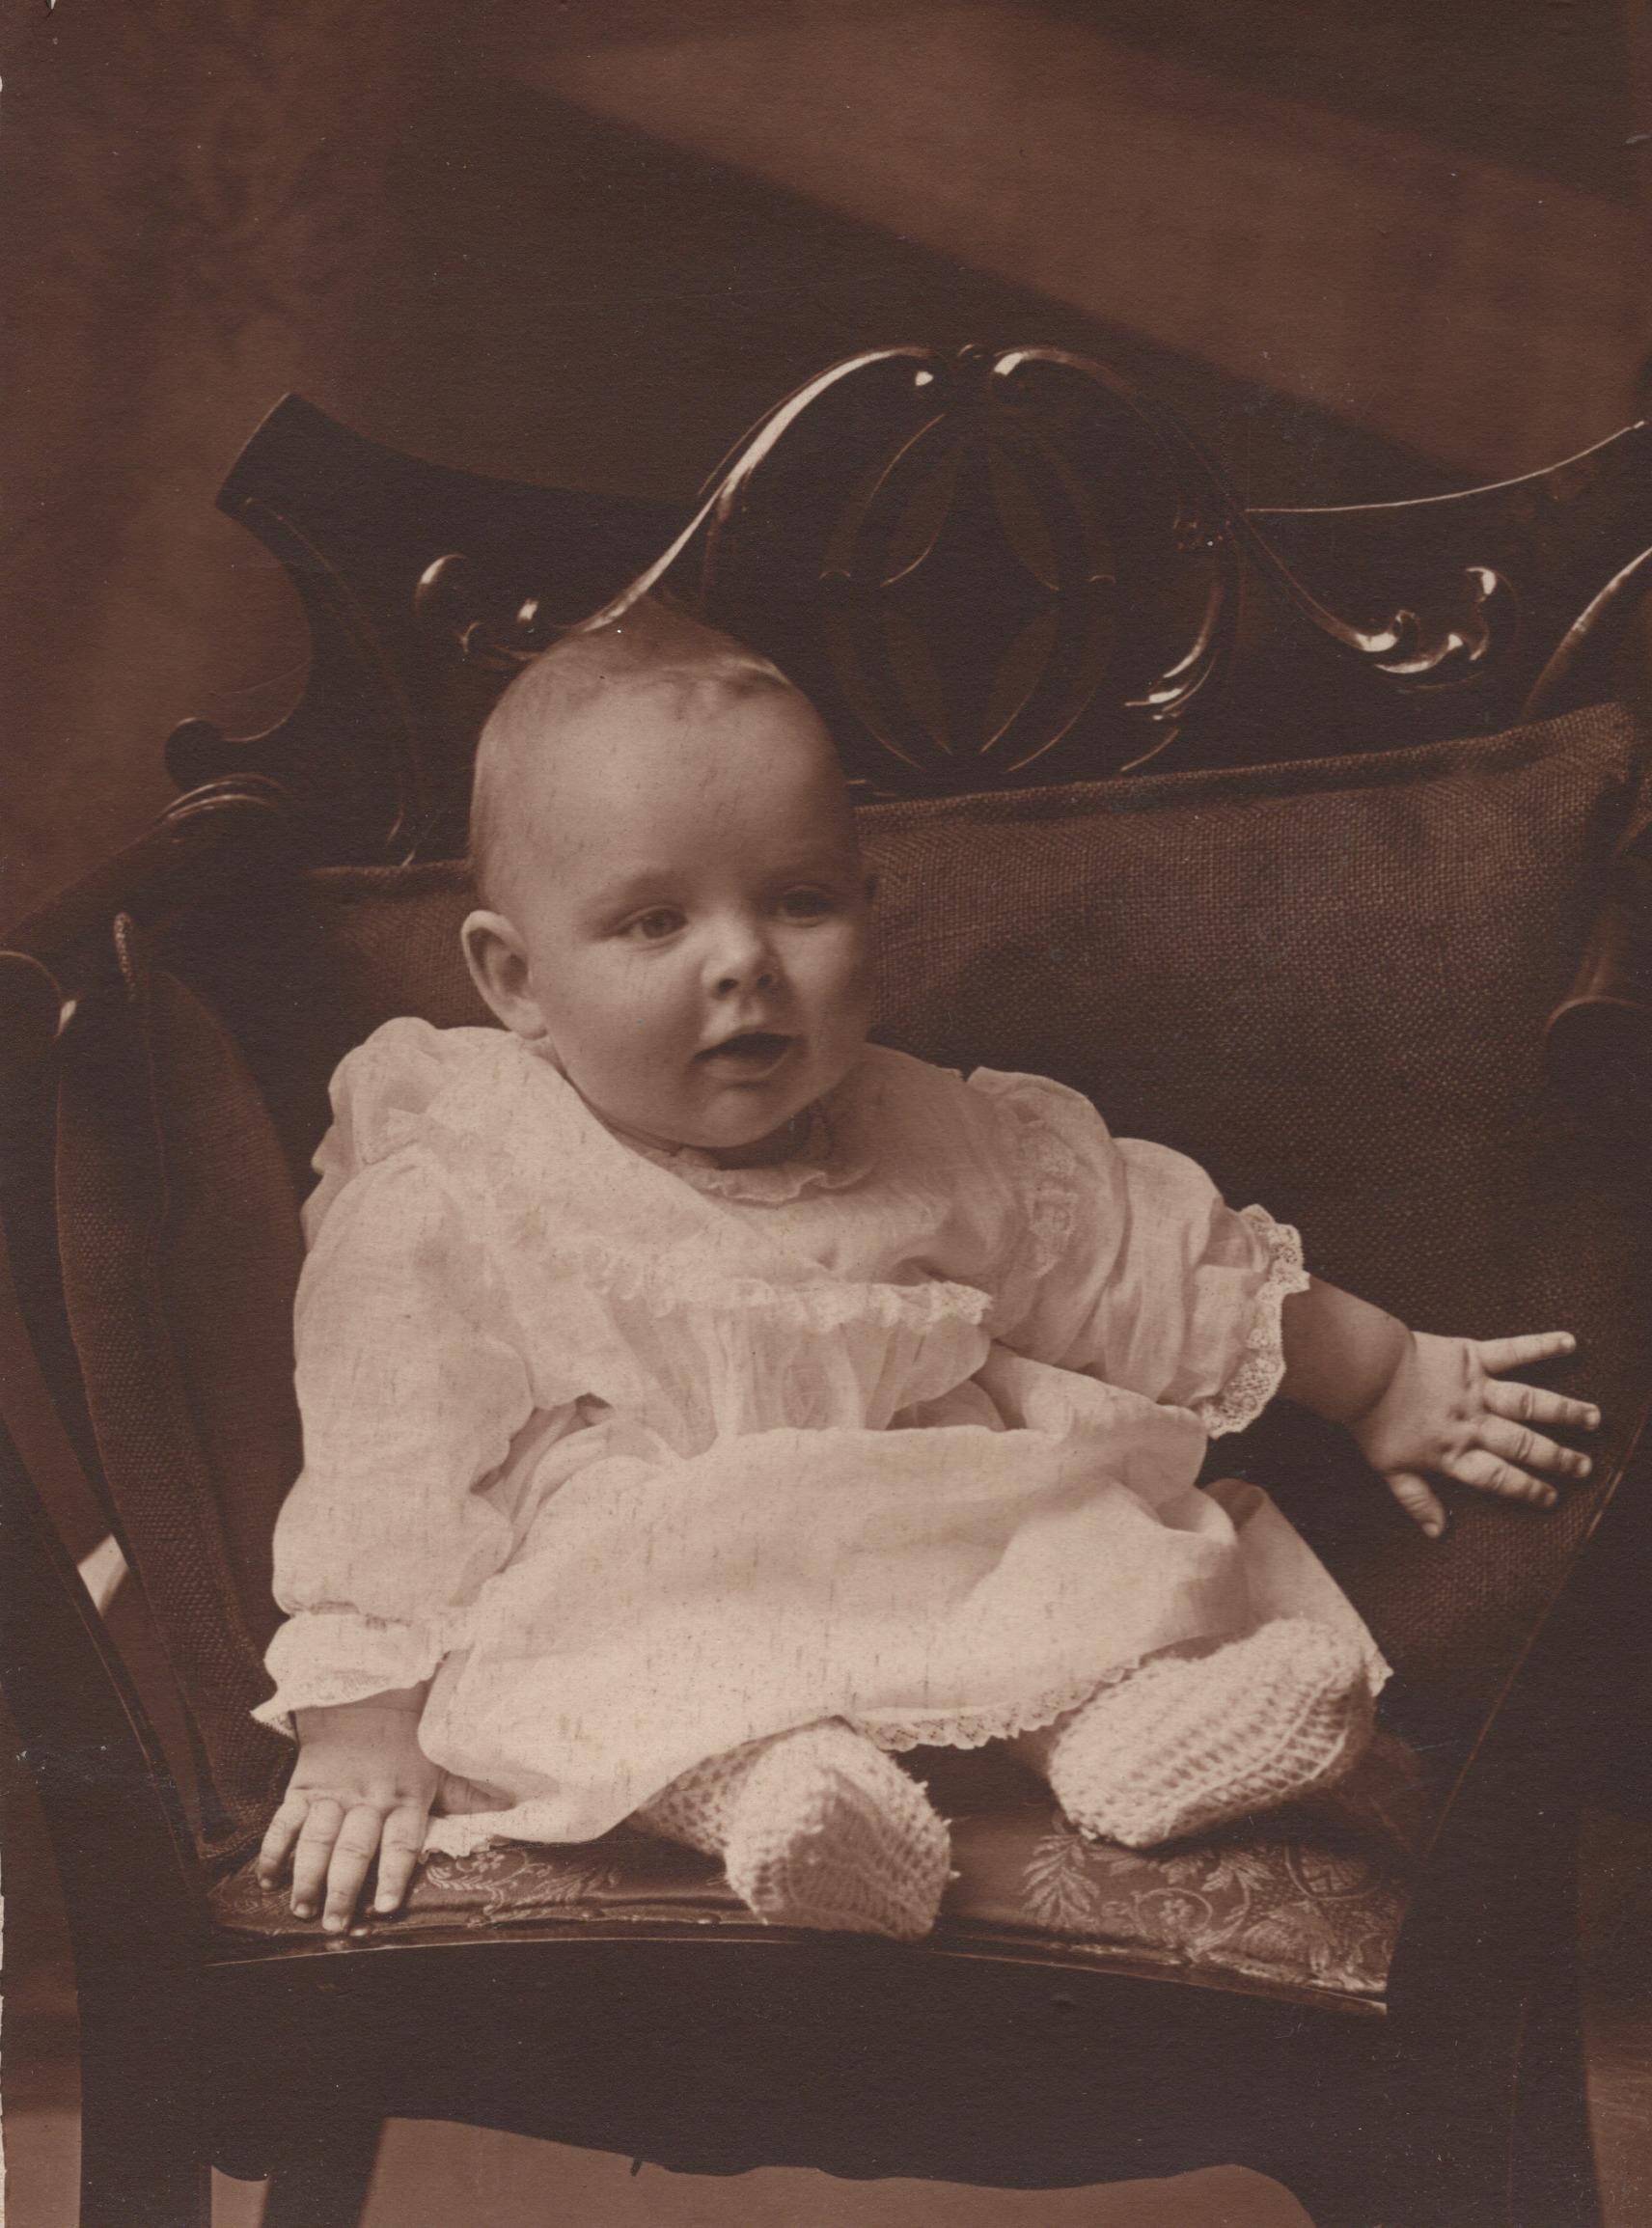 Shirley Phillips 1921 - Before